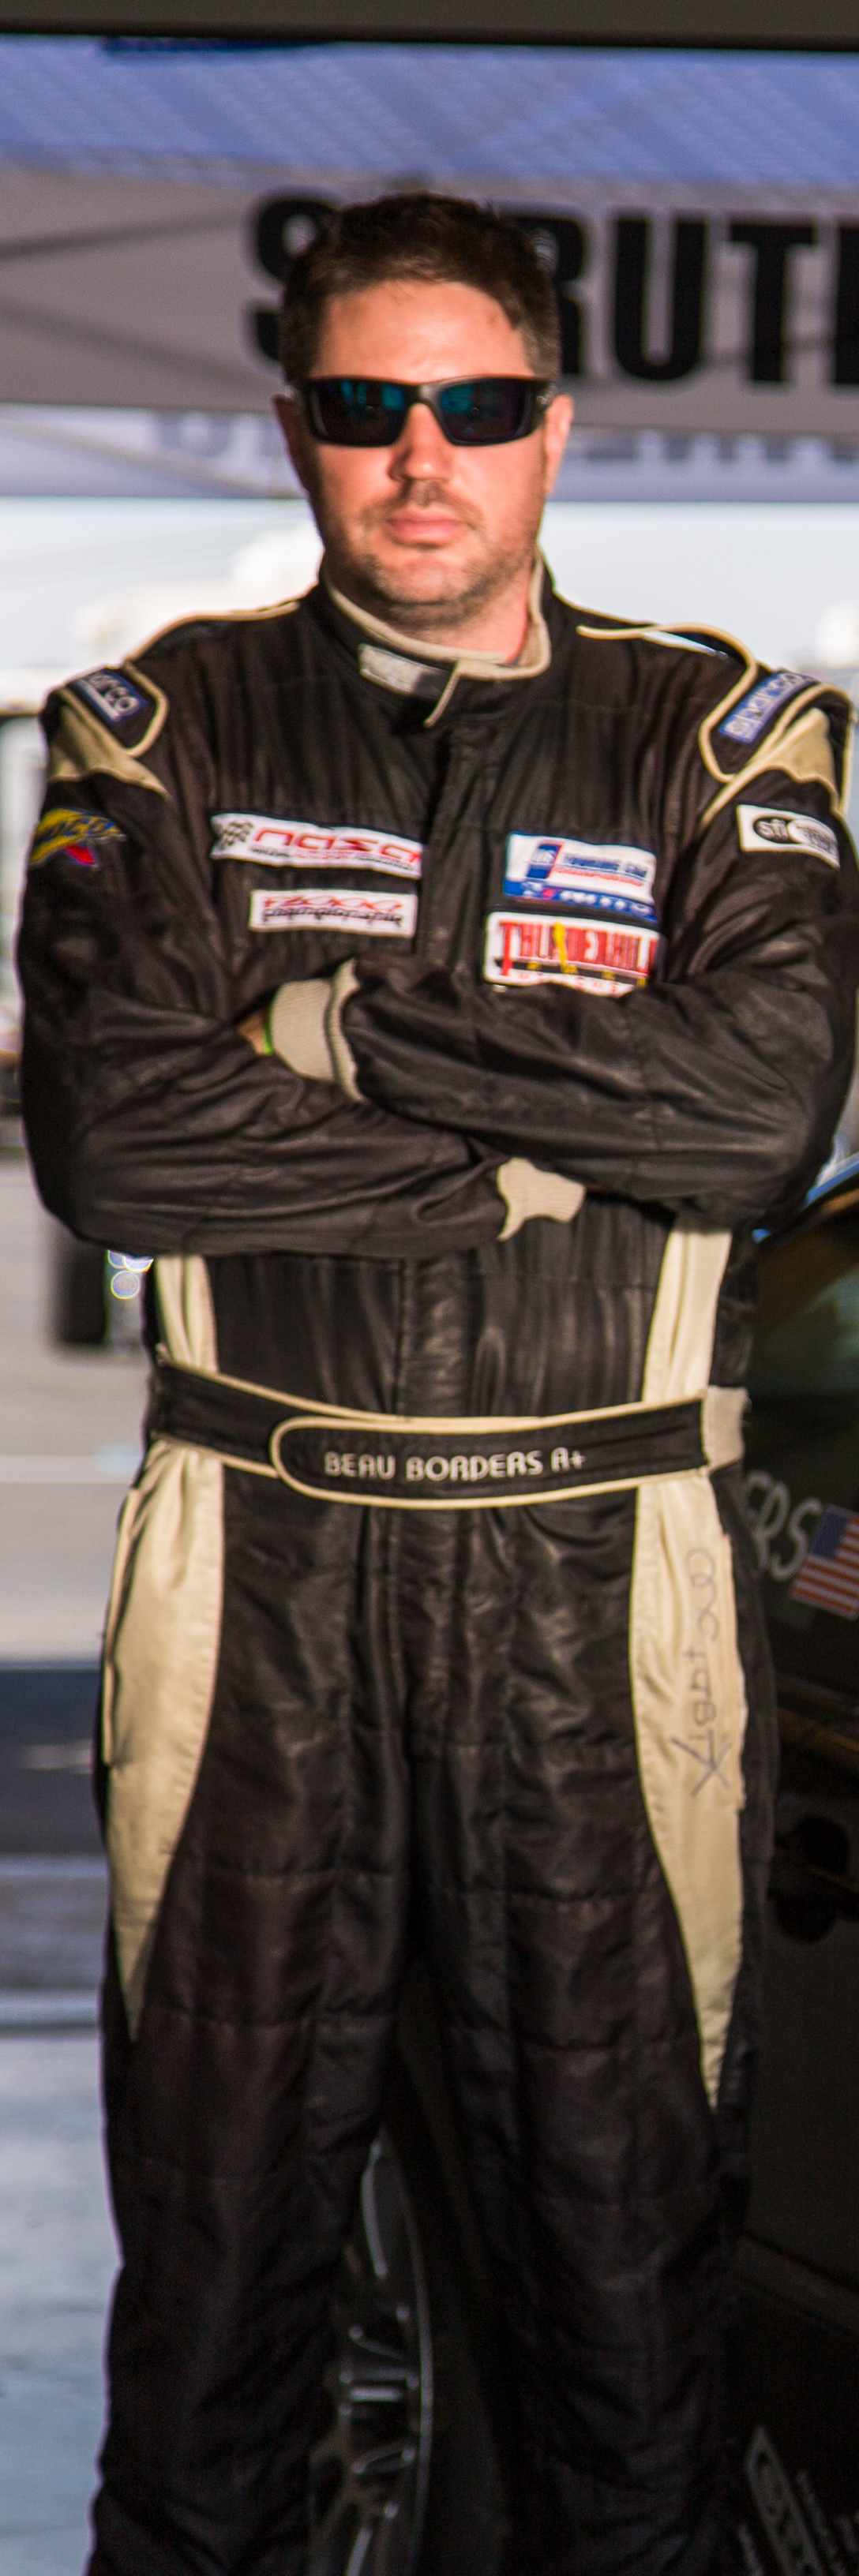 2015-06_RACE_Miller-USTCC-Pochop_4576.jpg